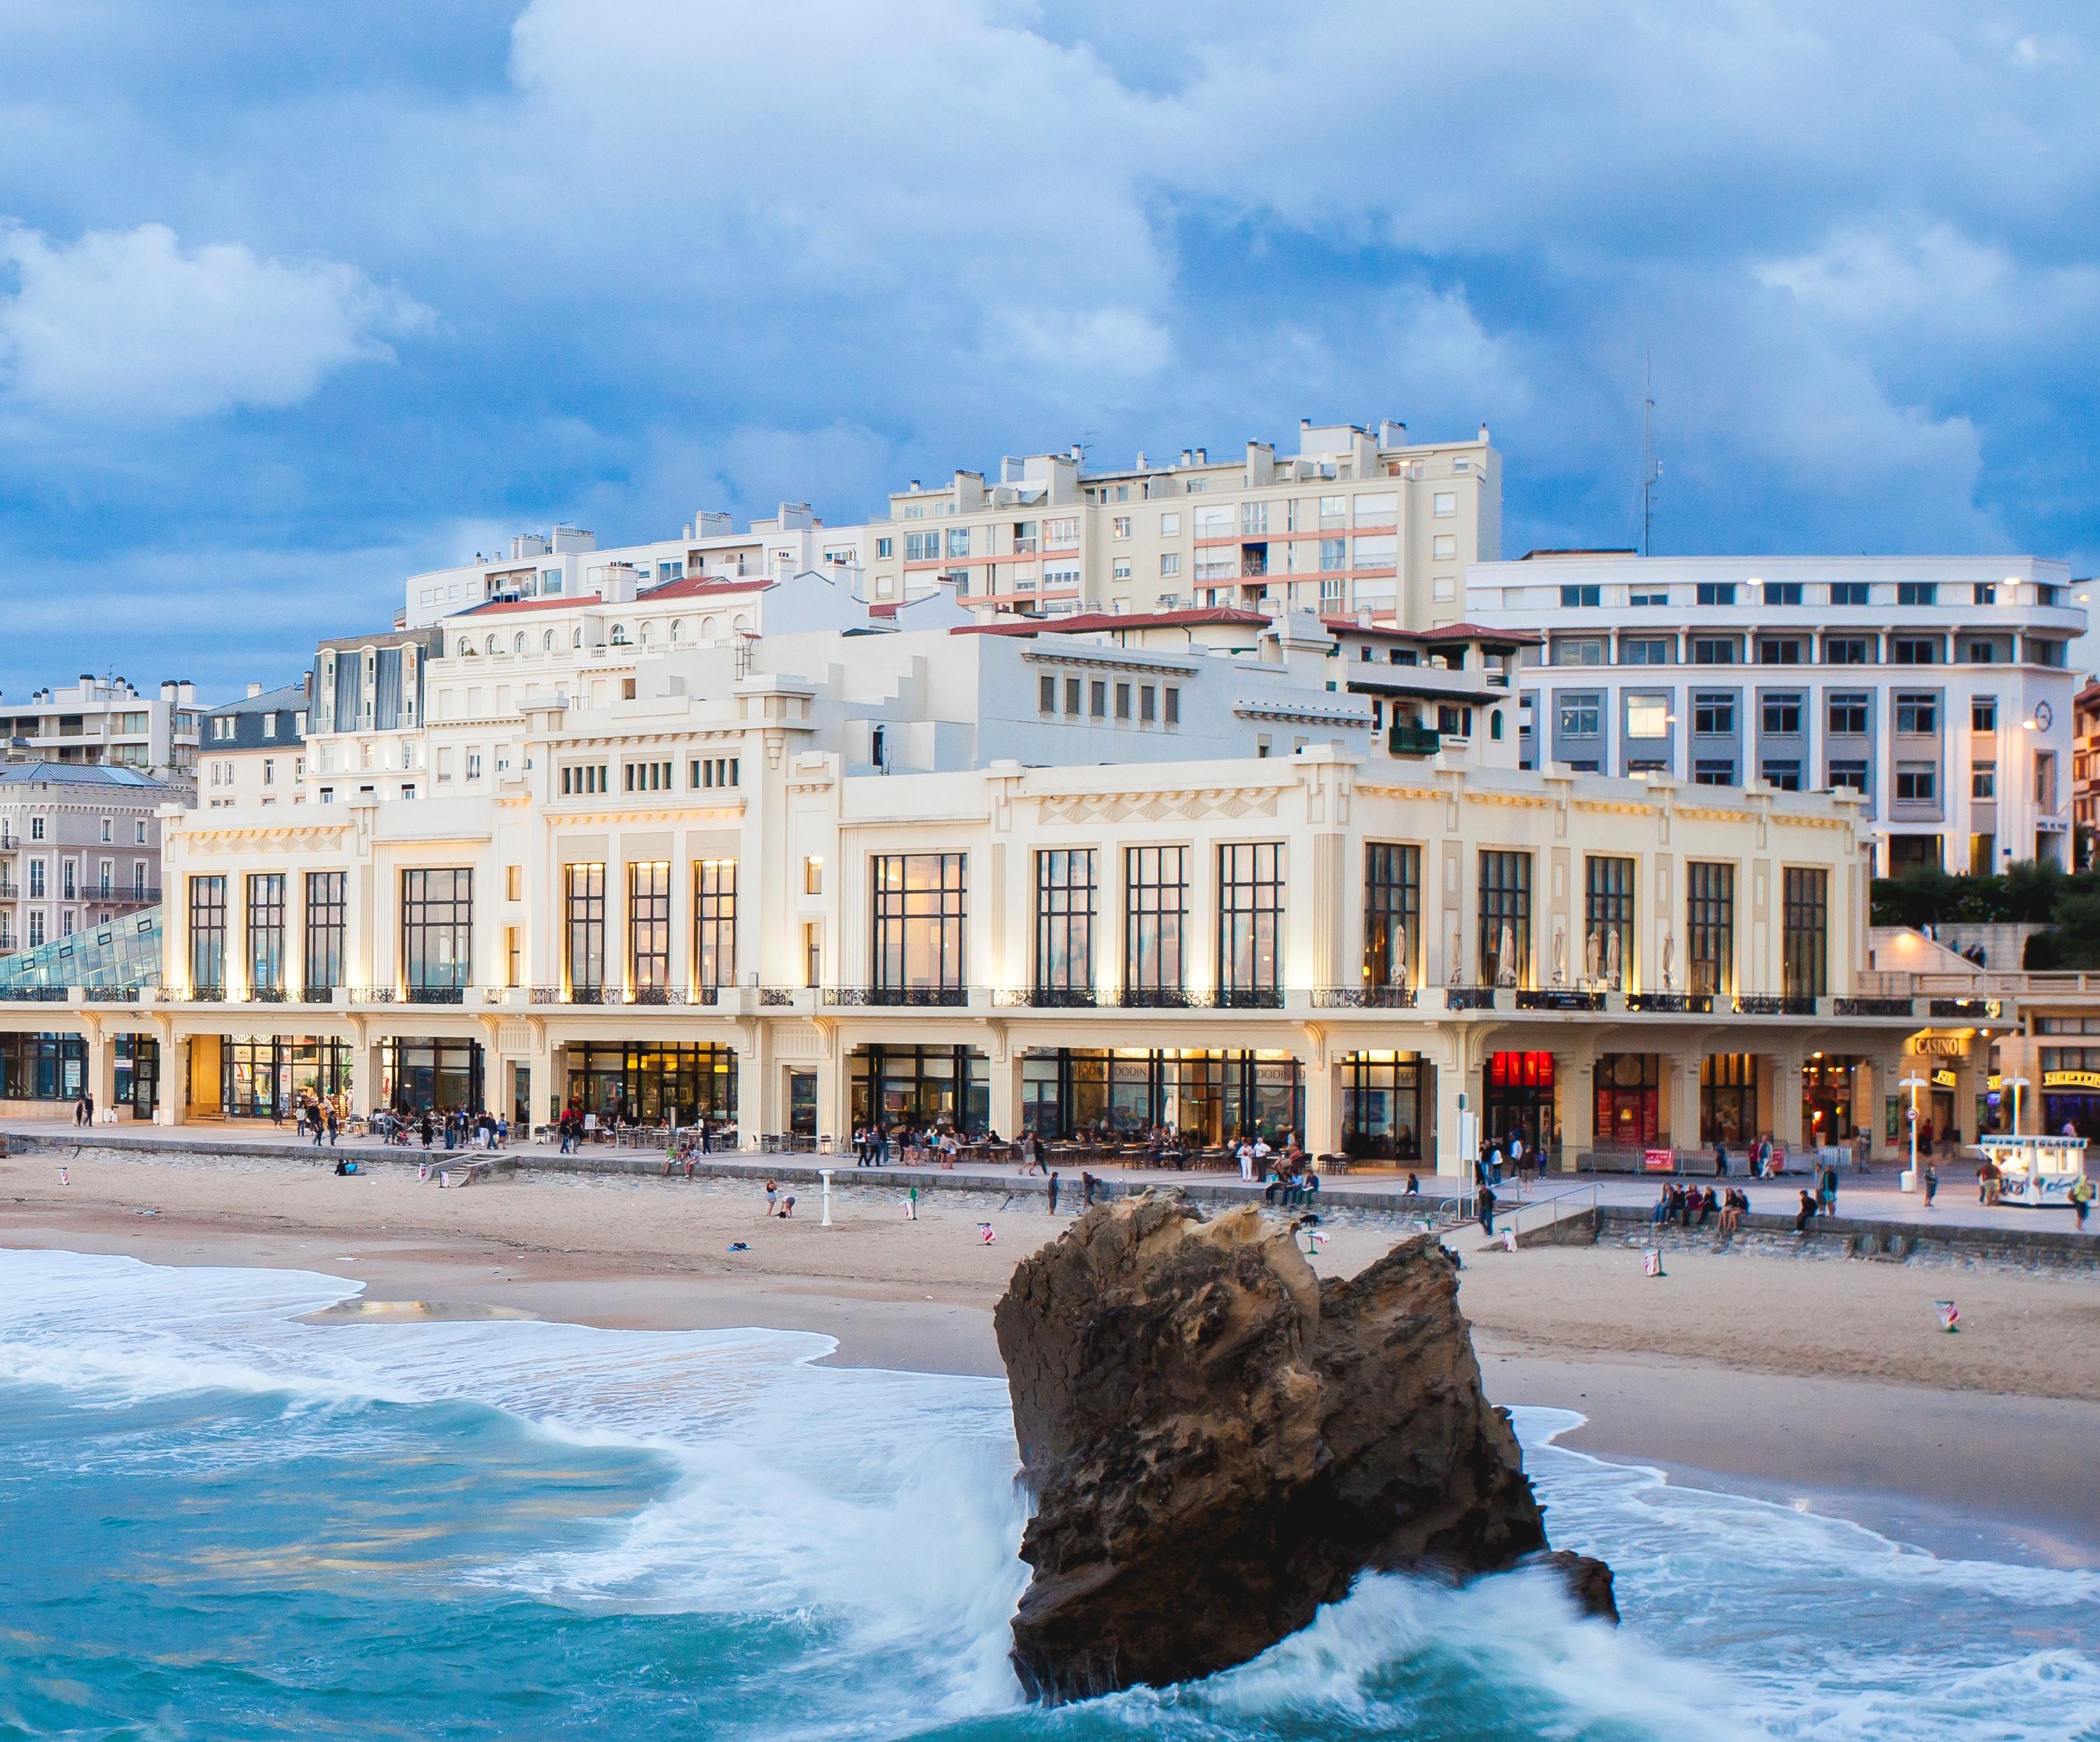 Casino Municipal of Biarritz